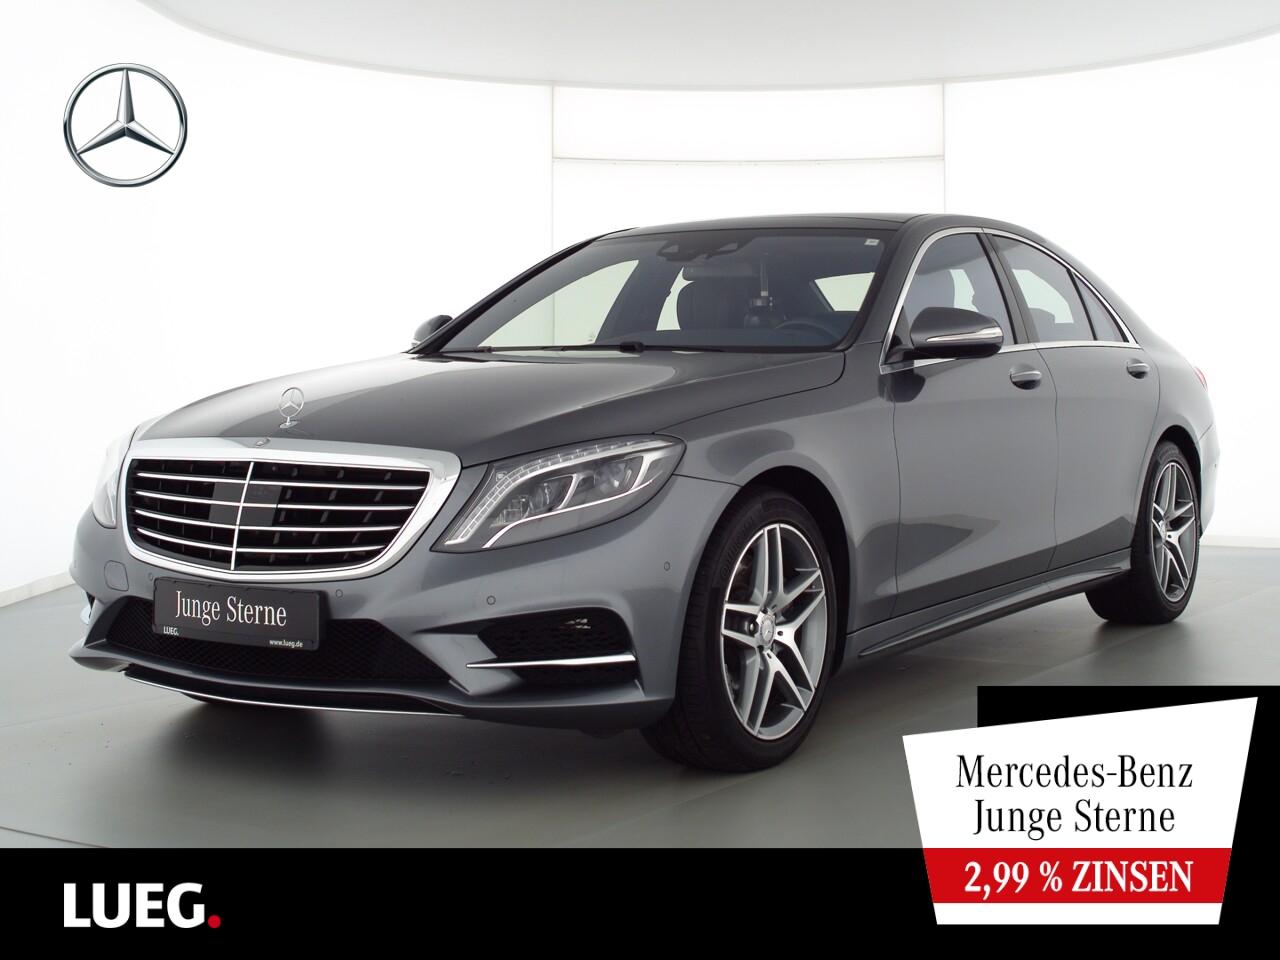 Mercedes-Benz S 400 4M AMG+COM+Pano+Burm+LED+Sitzklm+Sthzg+RFK, Jahr 2017, Benzin